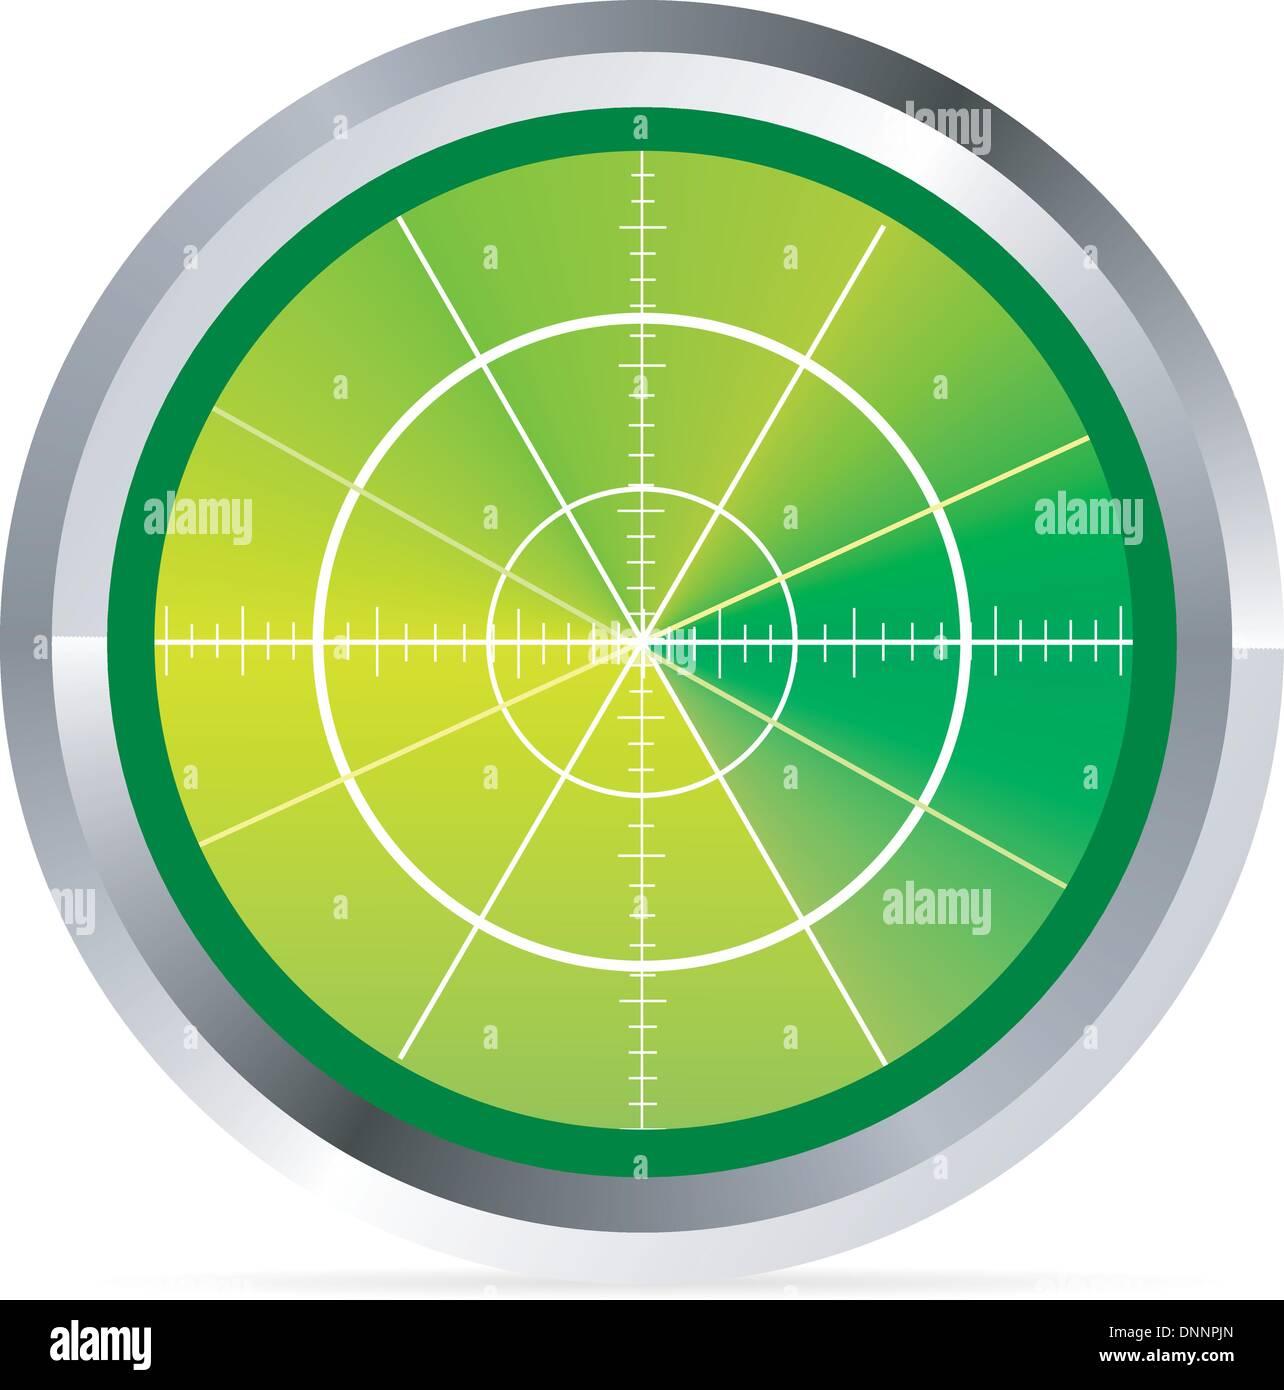 Illustration de radar ou un moniteur de l'oscilloscope Photo Stock